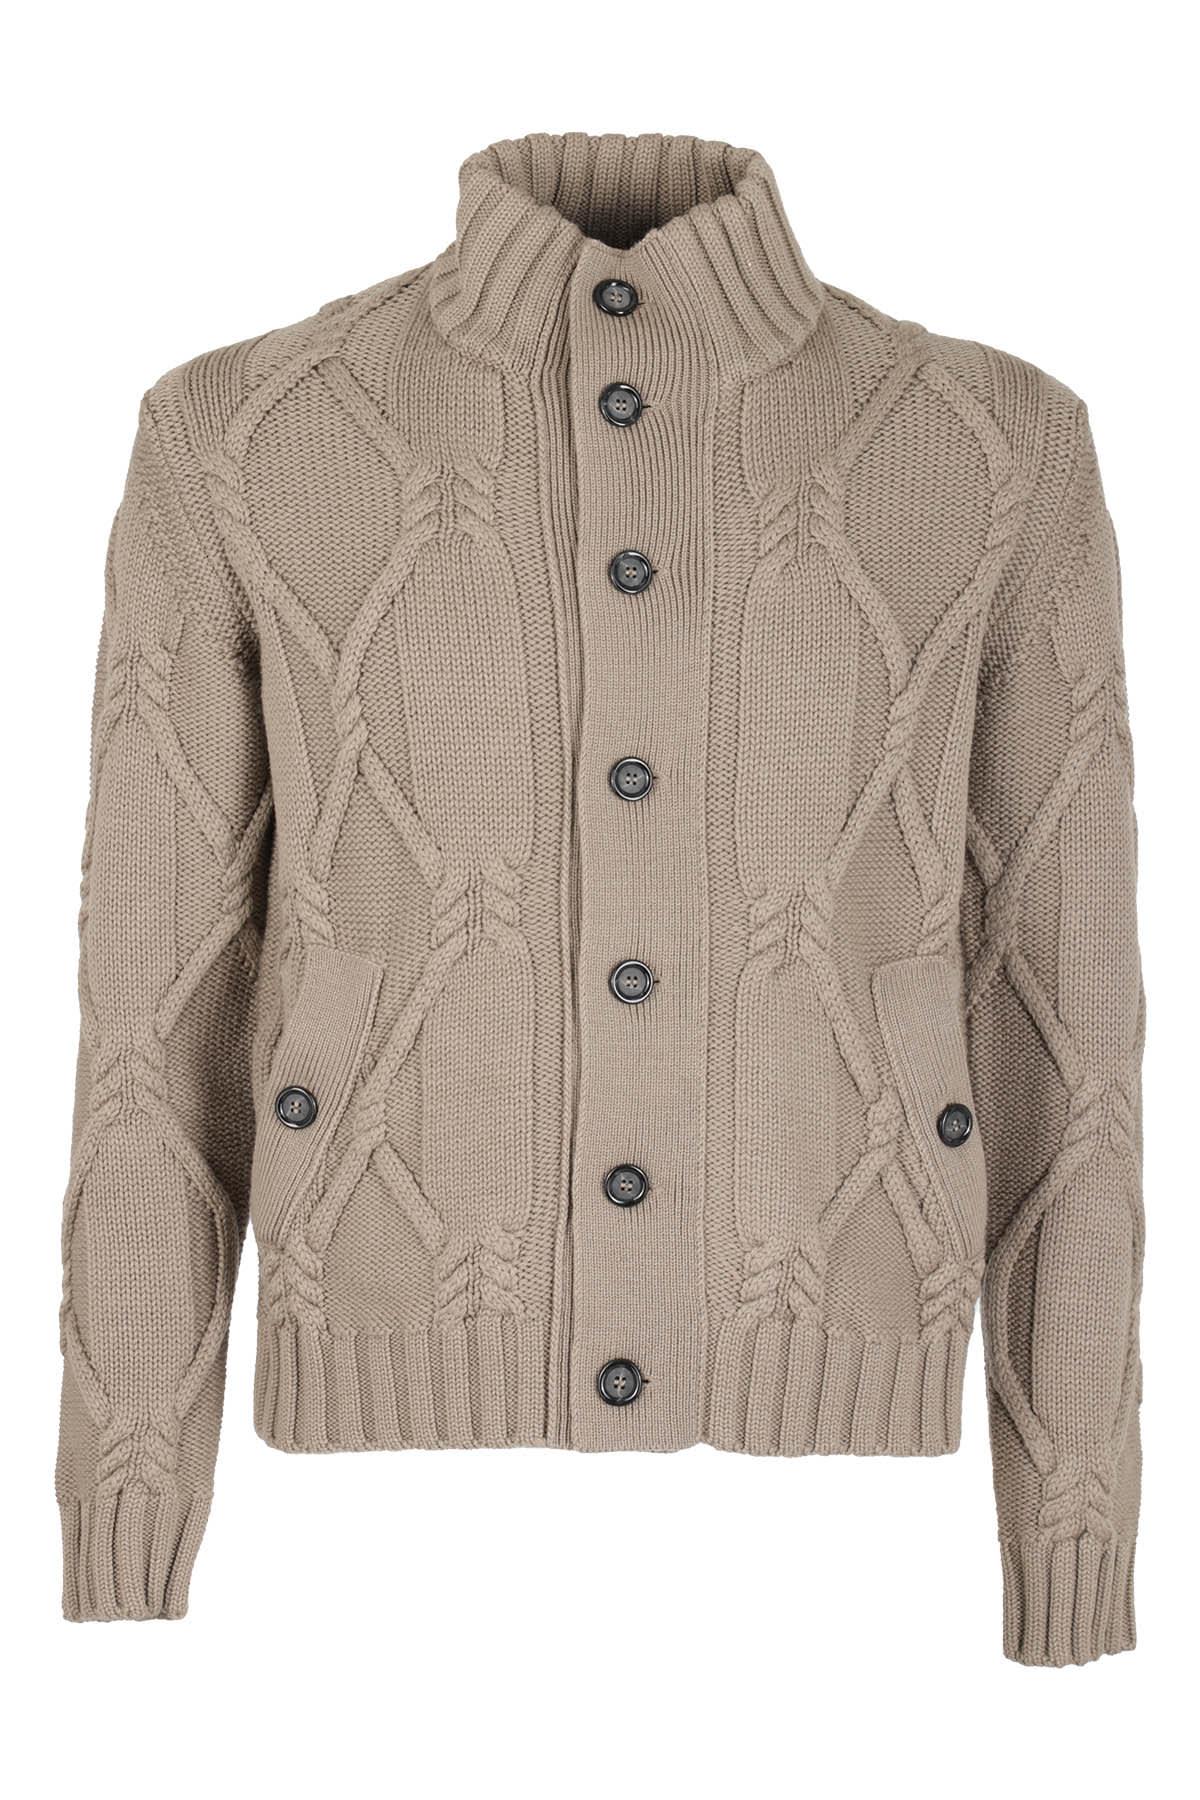 Paolo Pecora Jacket